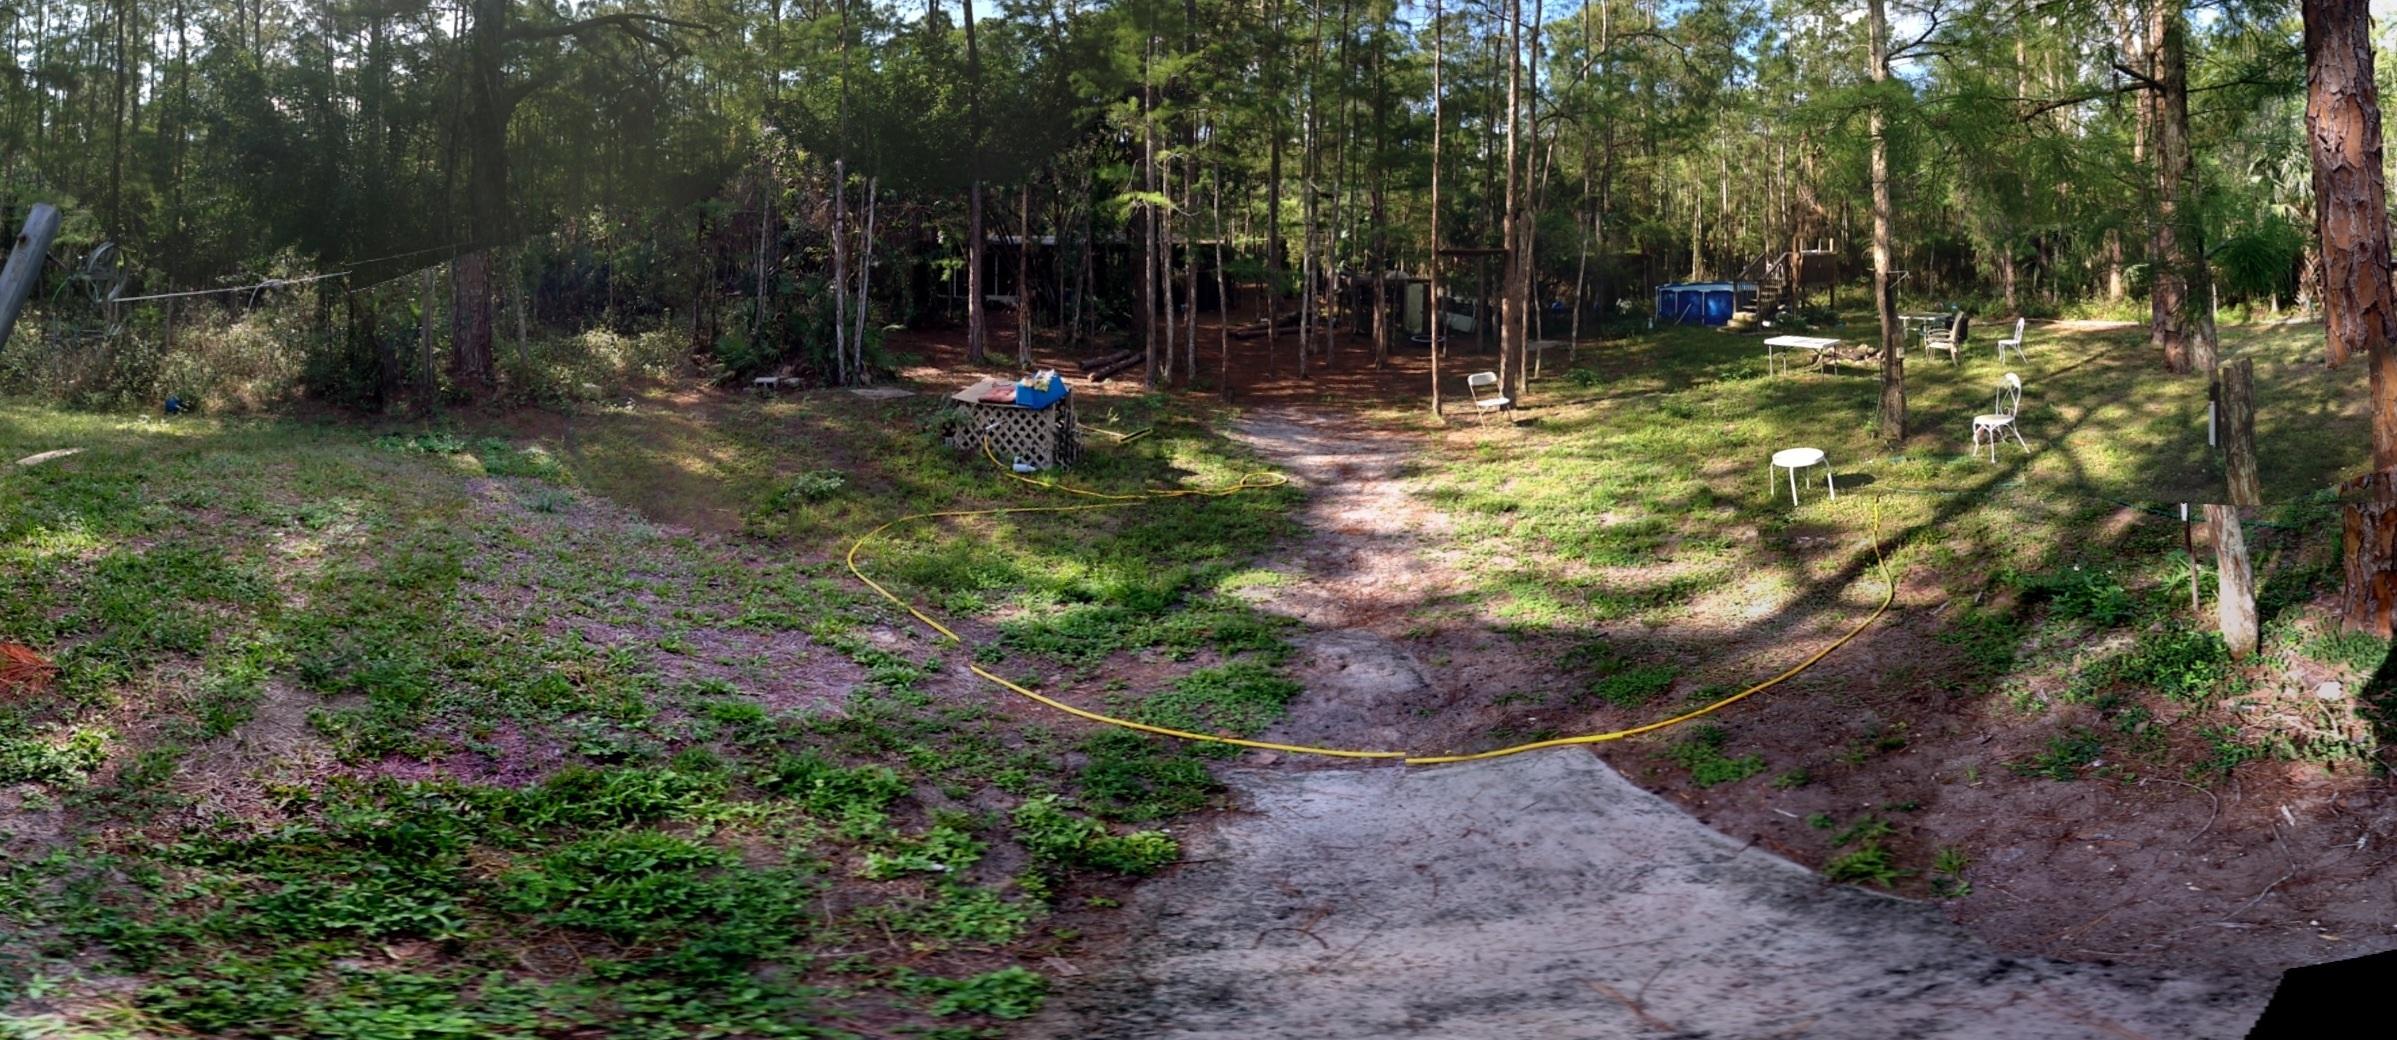 backyard-panor-2013-04-12 09.41.47